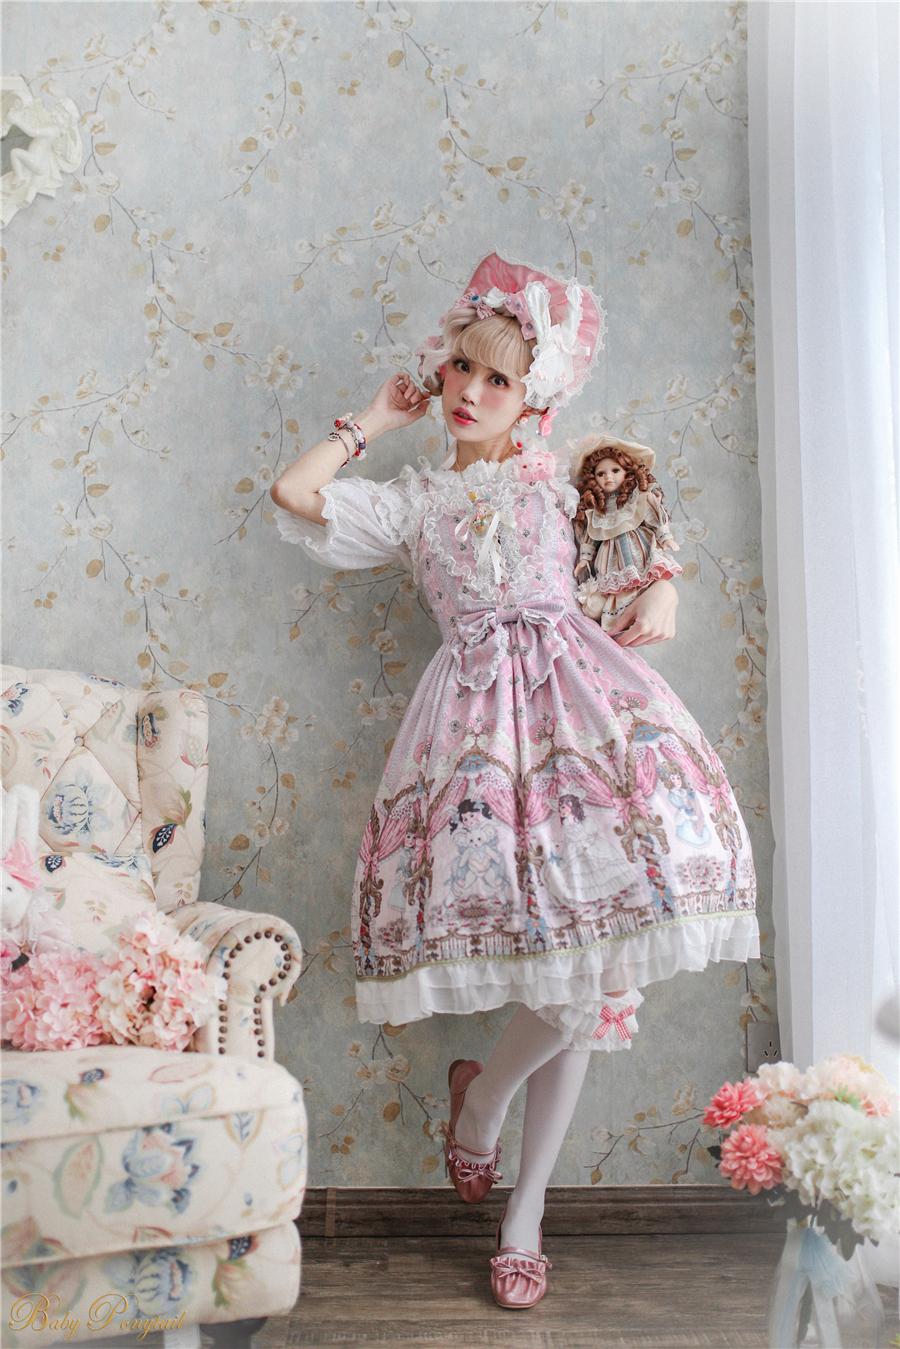 BabyPonytail_Model Photo_My Favorite Companion_JSK Pink_Kaka_02.jpg